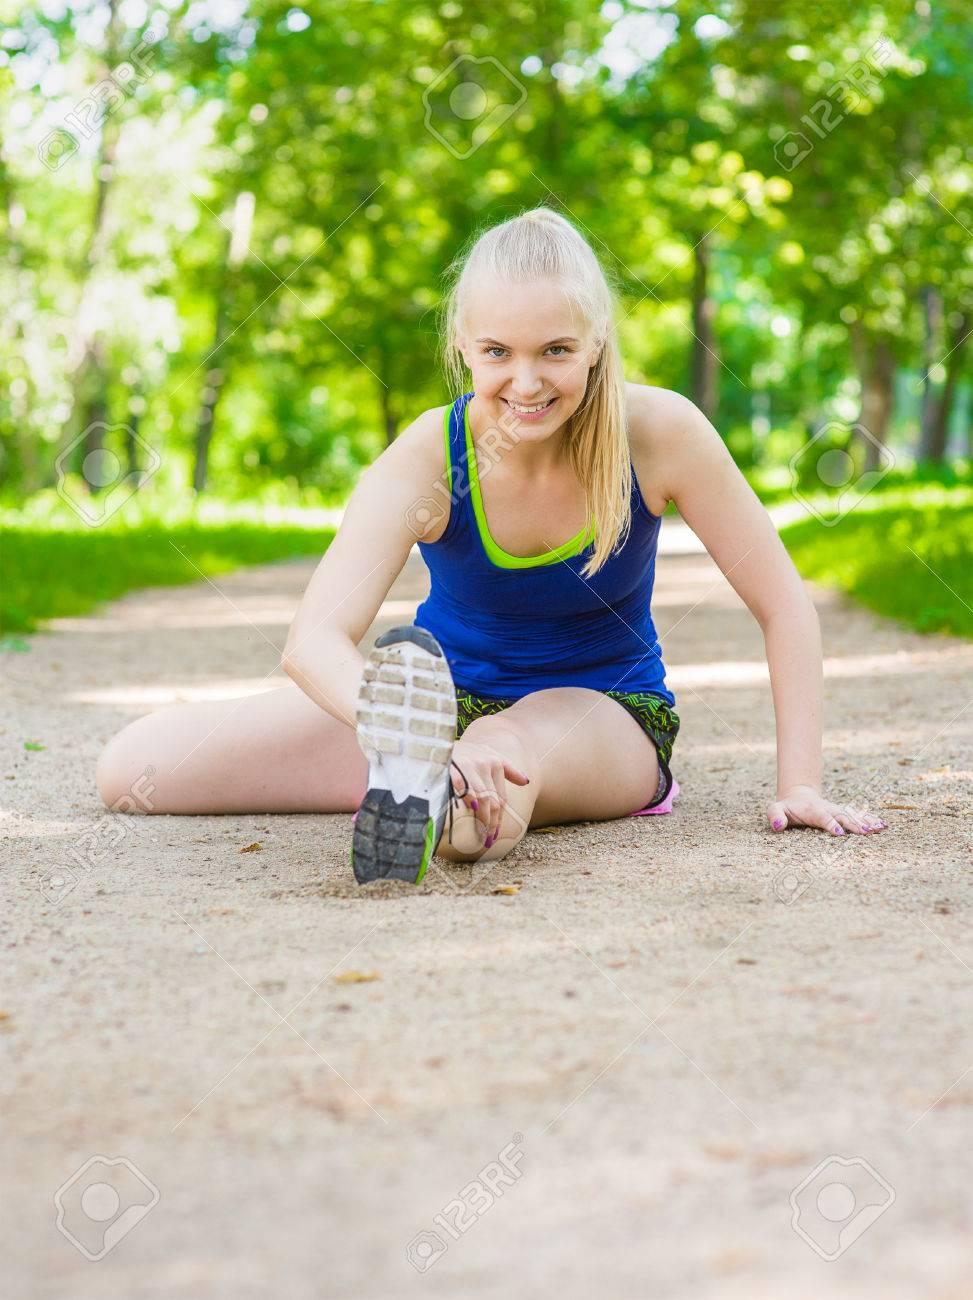 Happy Teen Girl Stretching Legs Before Run Stock Photo 60933899